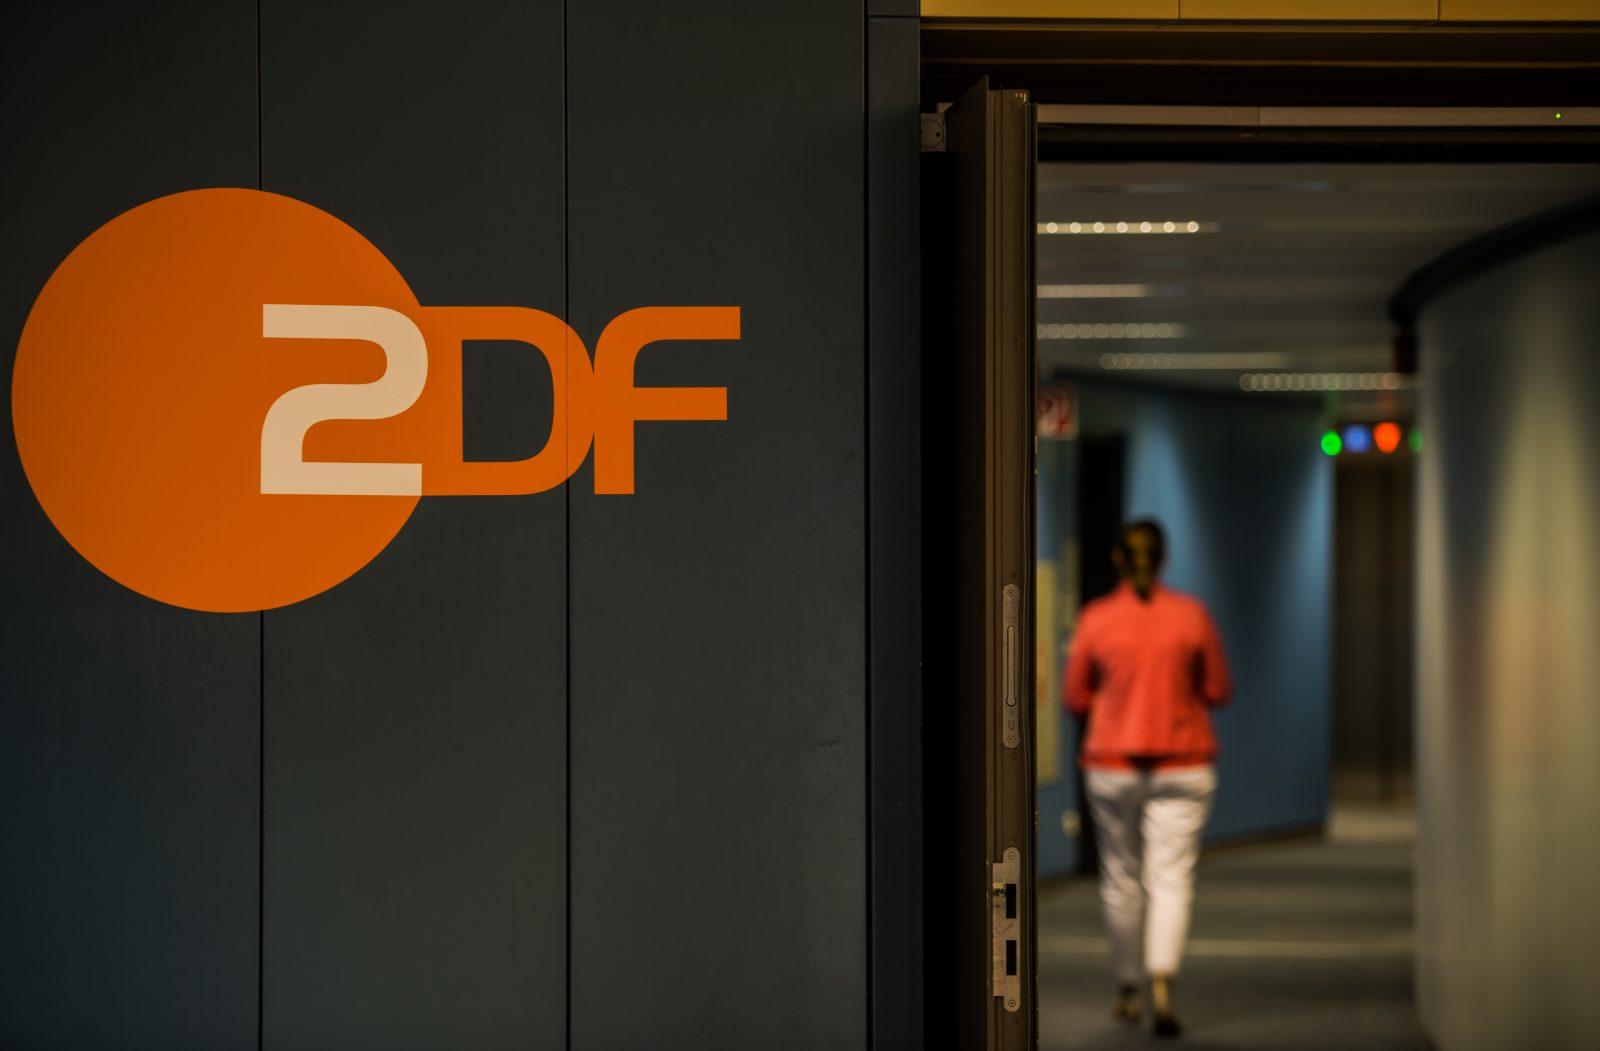 ZDF-Sendegebäube